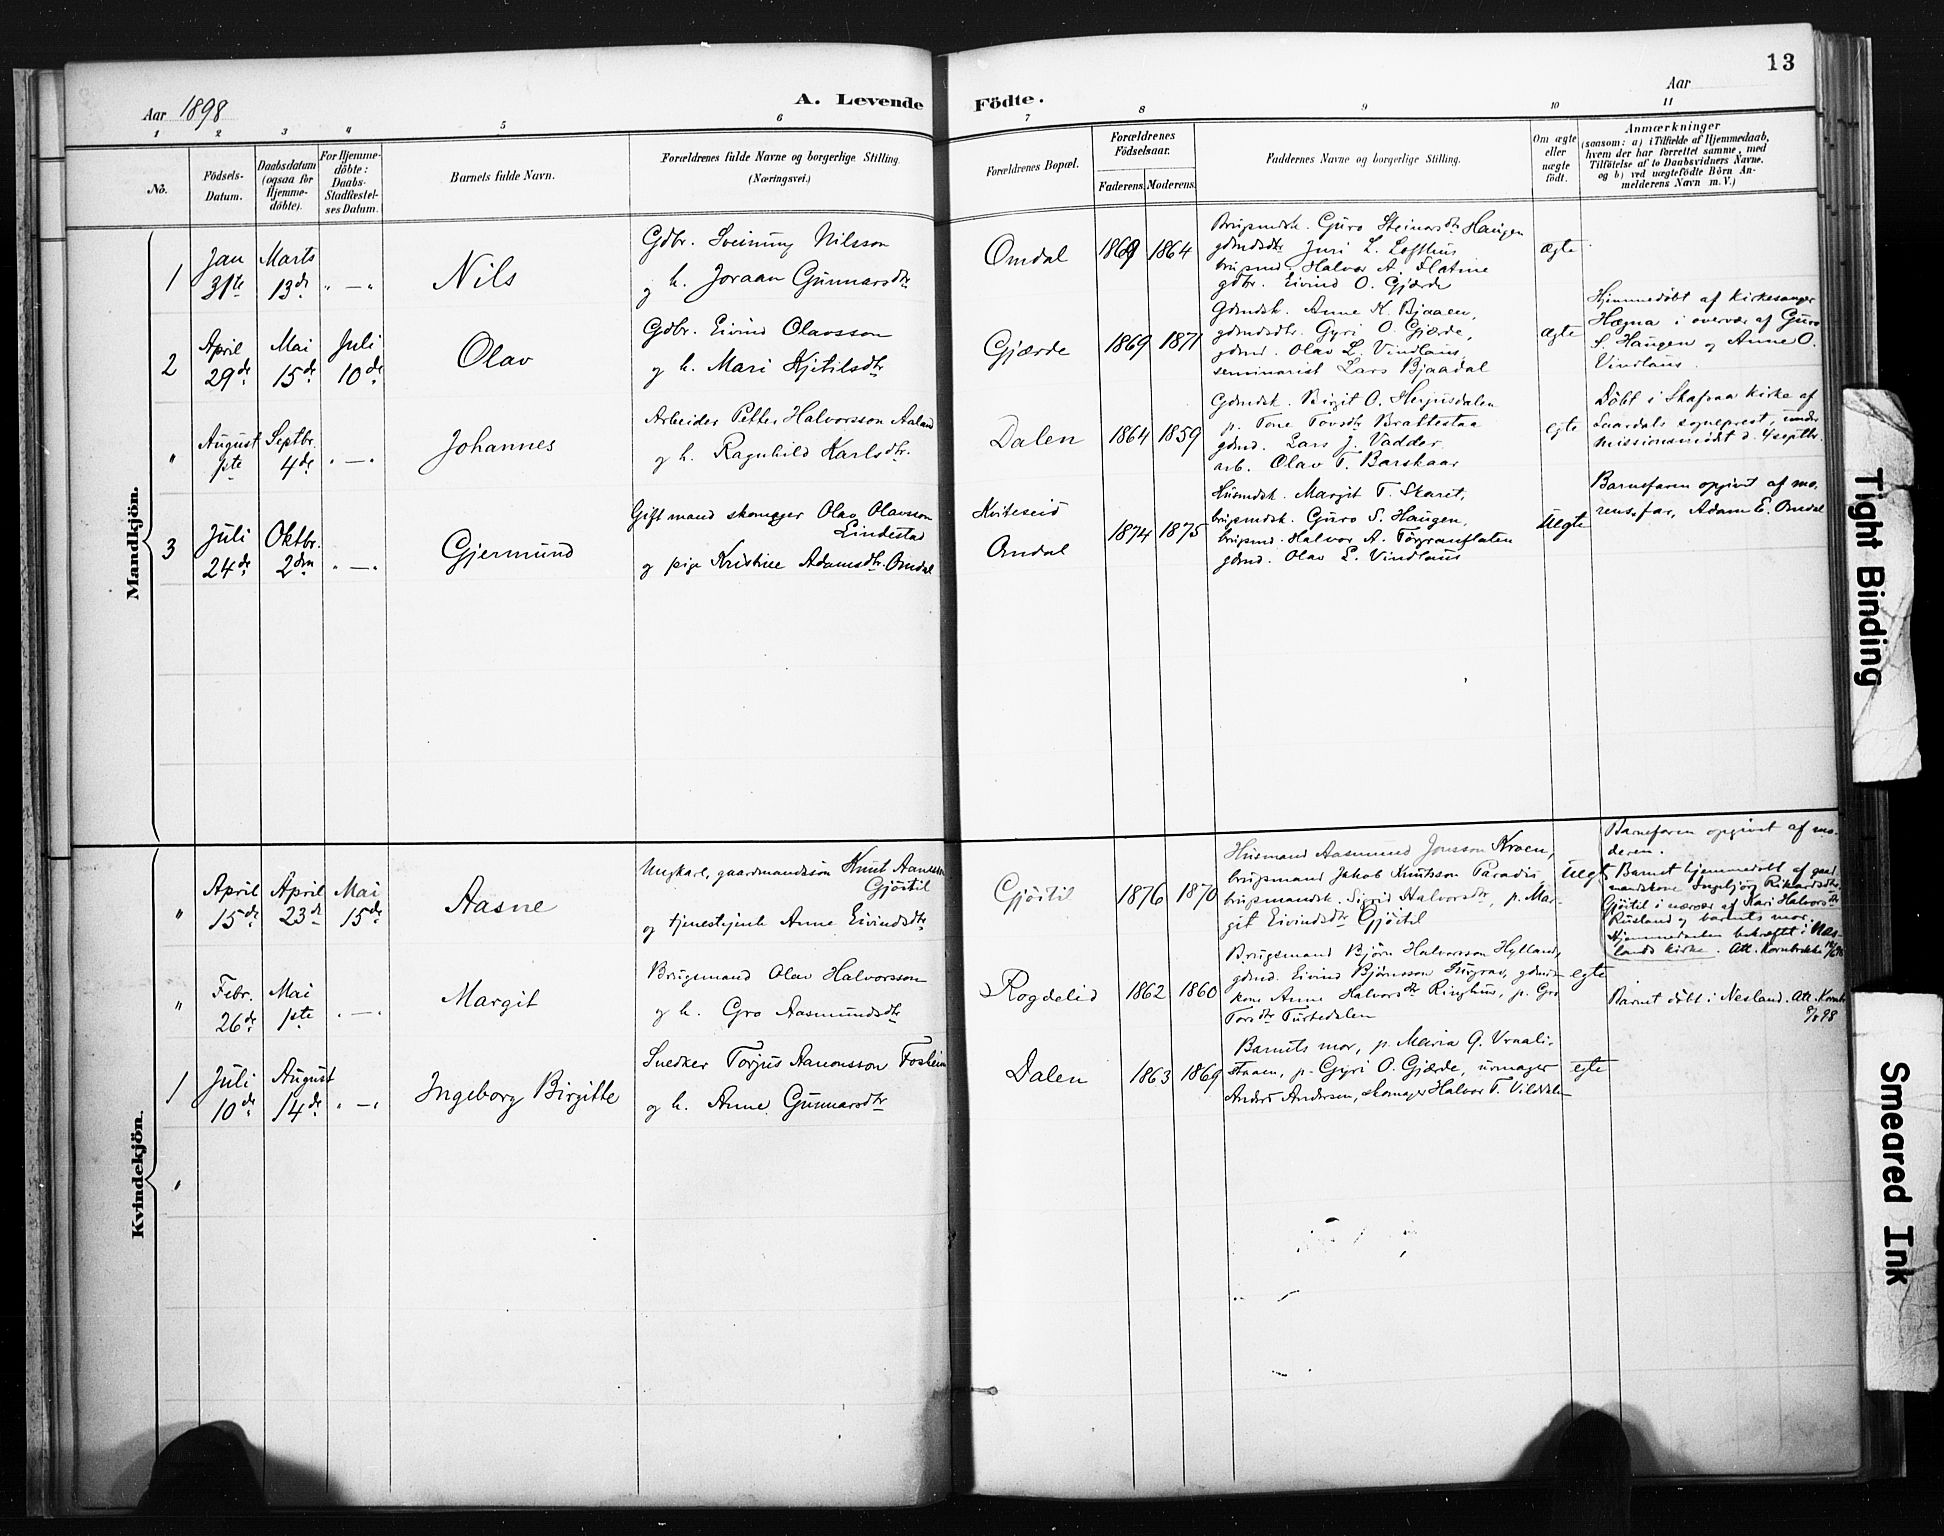 SAKO, Lårdal kirkebøker, F/Fb/L0002: Ministerialbok nr. II 2, 1887-1918, s. 13